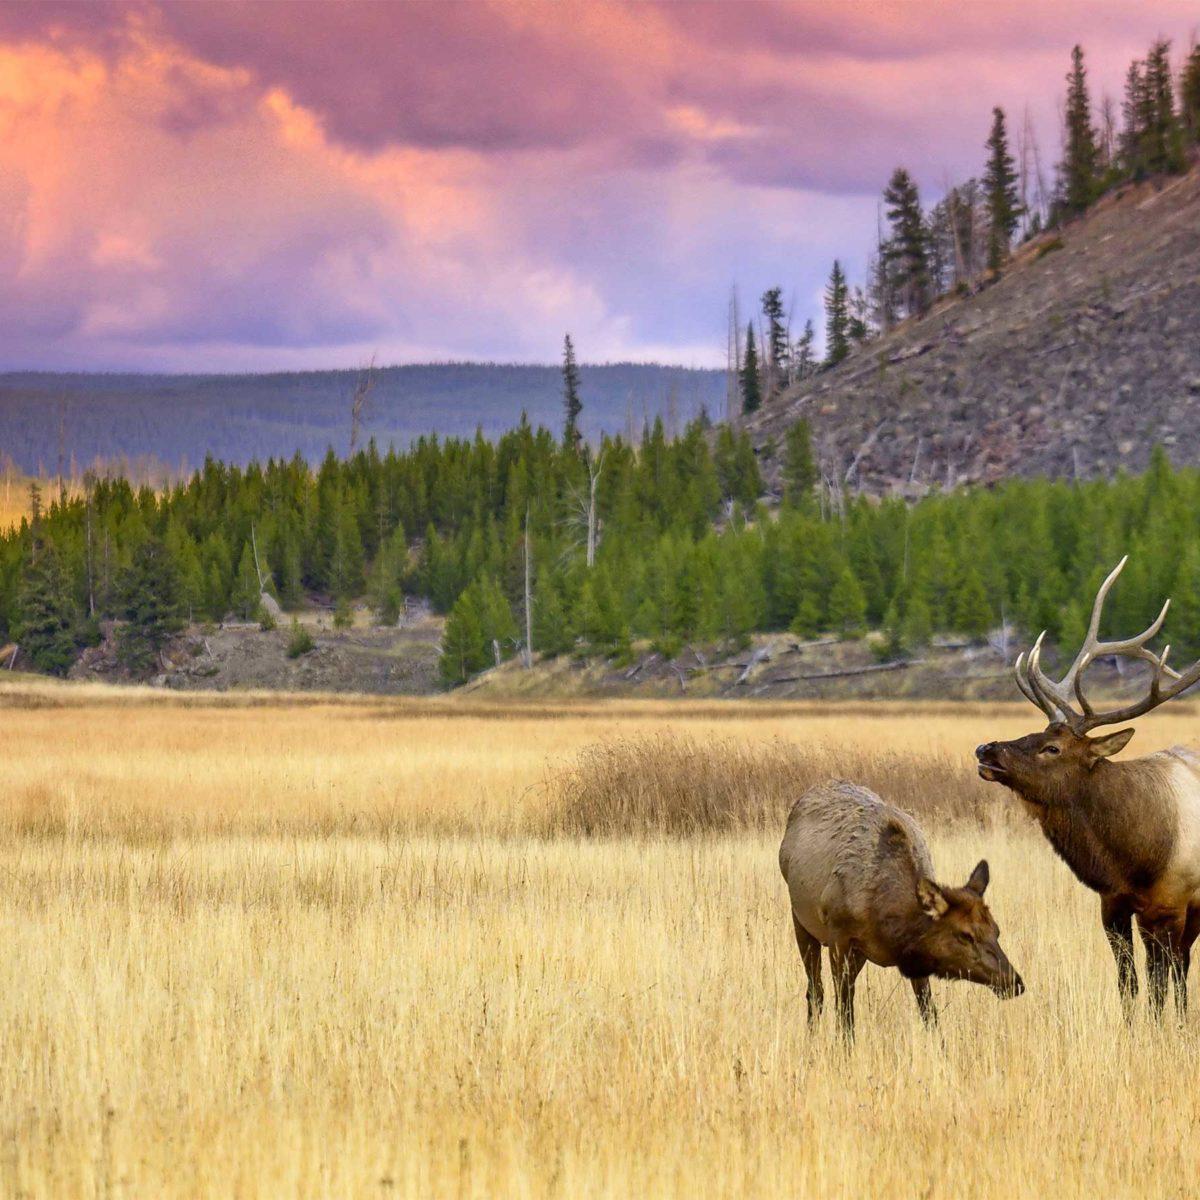 20 Amazing Wildlife Photos in Yellowstone National Park